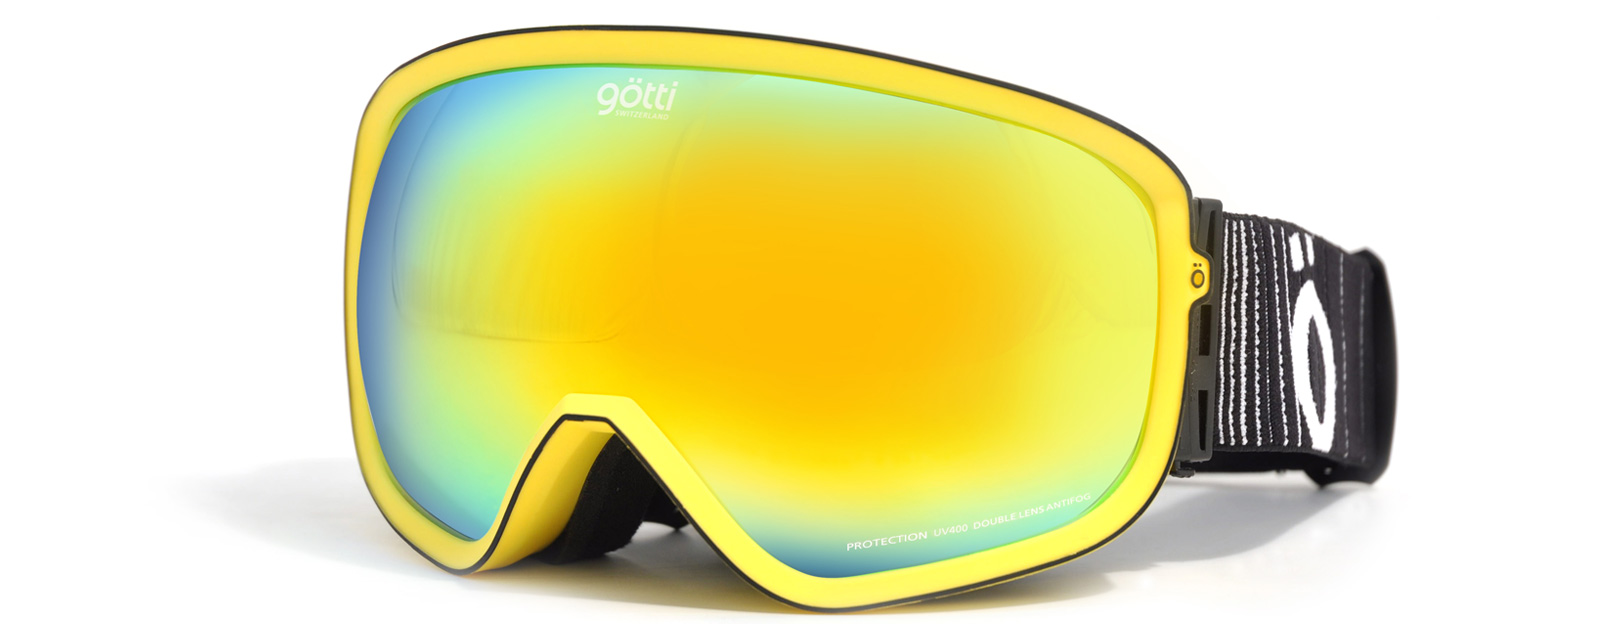 goggle_yellow